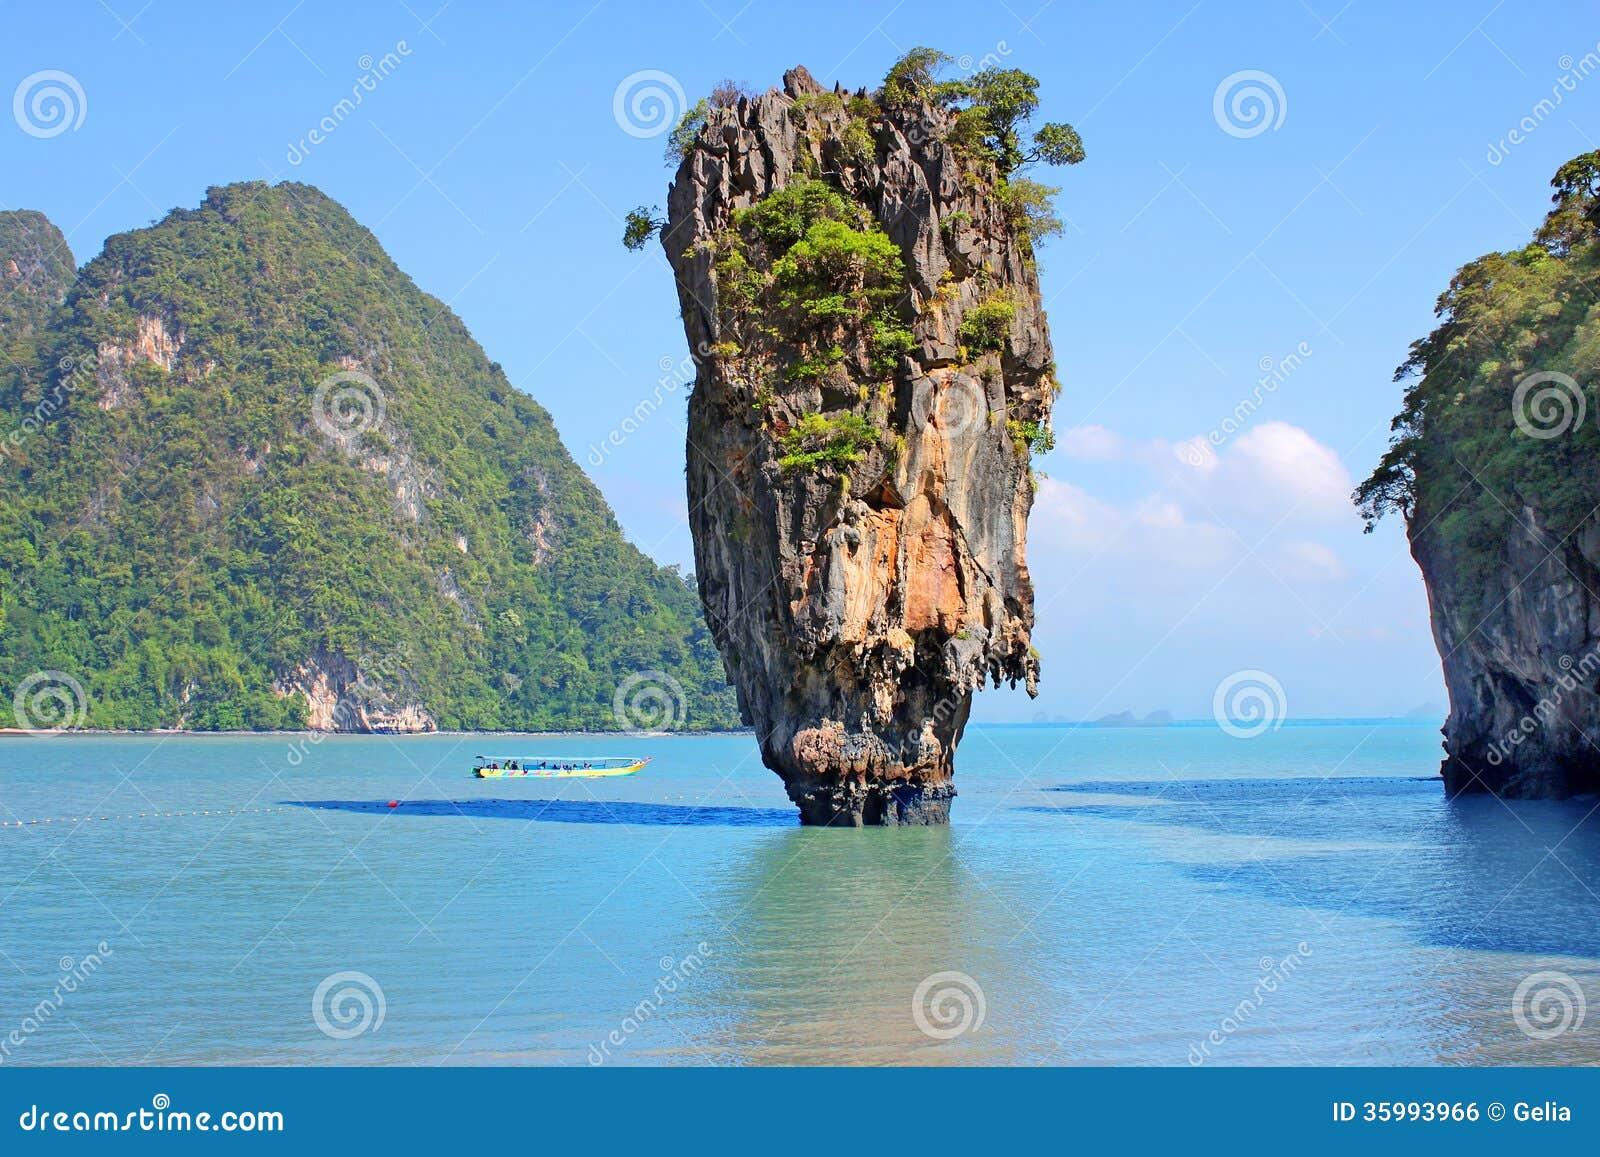 Krabi Province Best Beaches